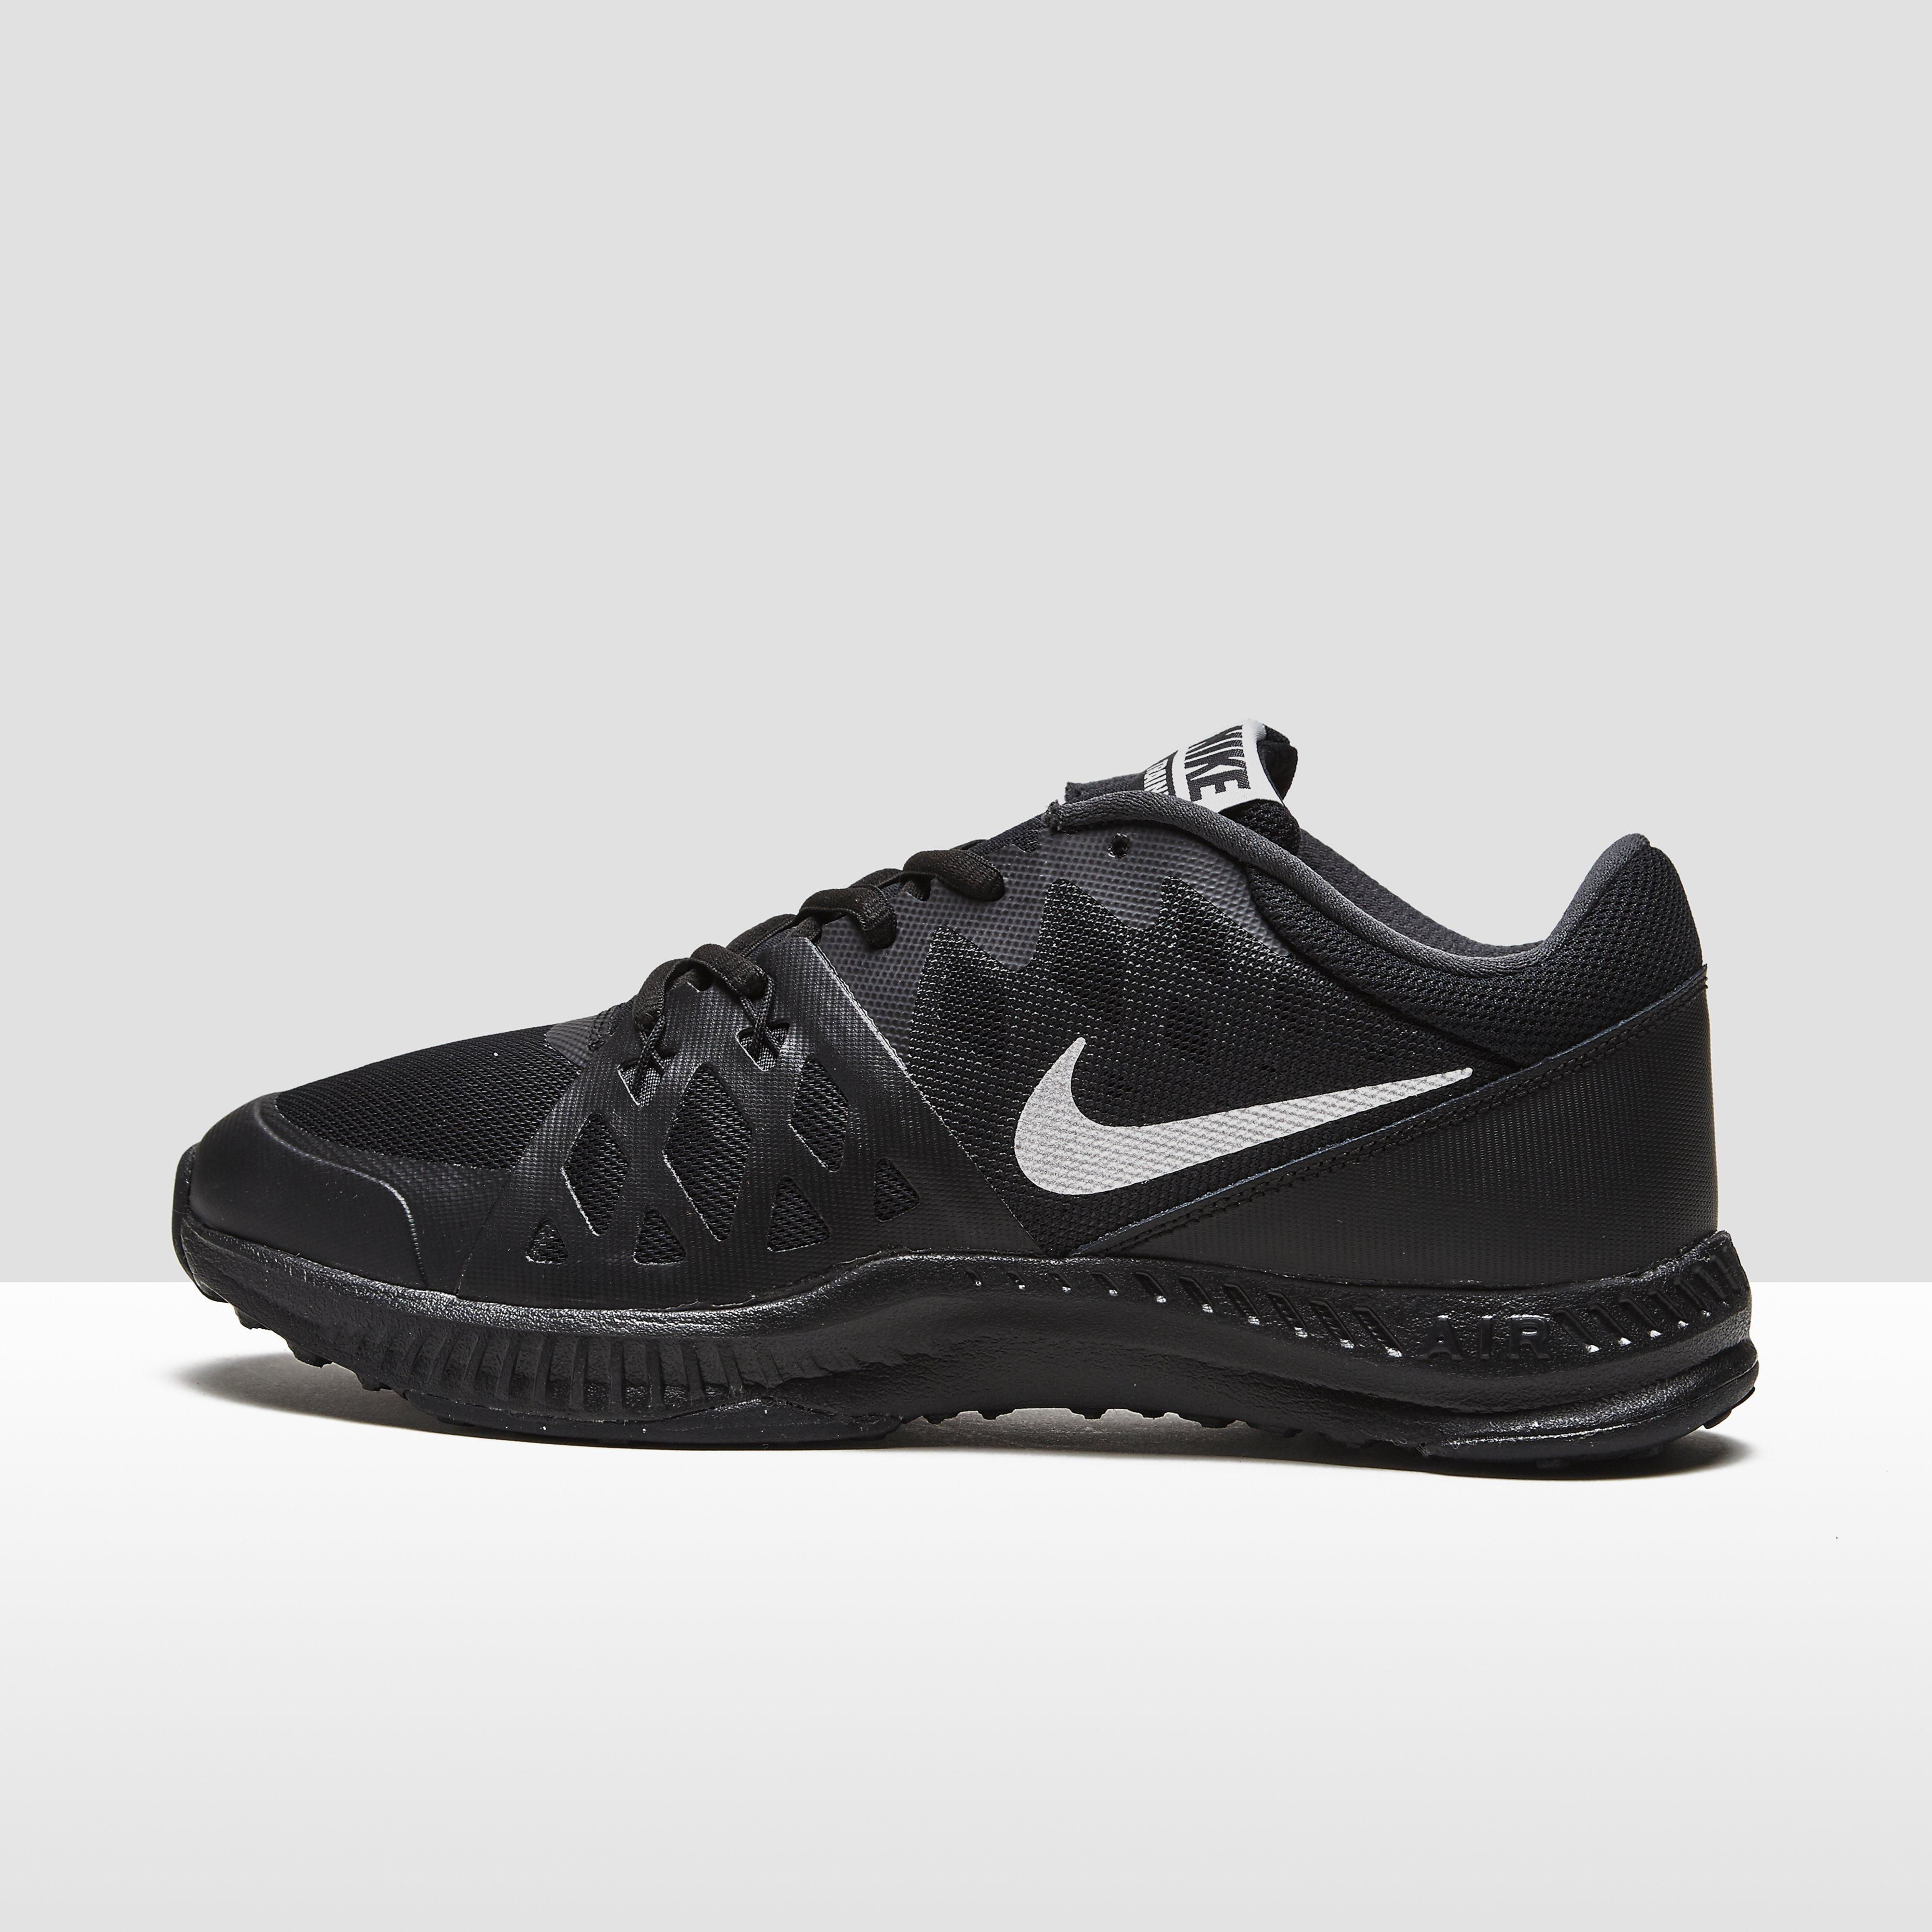 Nike - Metcon Repper Dsx Chaussures De Fitness - Hommes - Chaussures De Fitness - Noir - 41 4o55Bv5